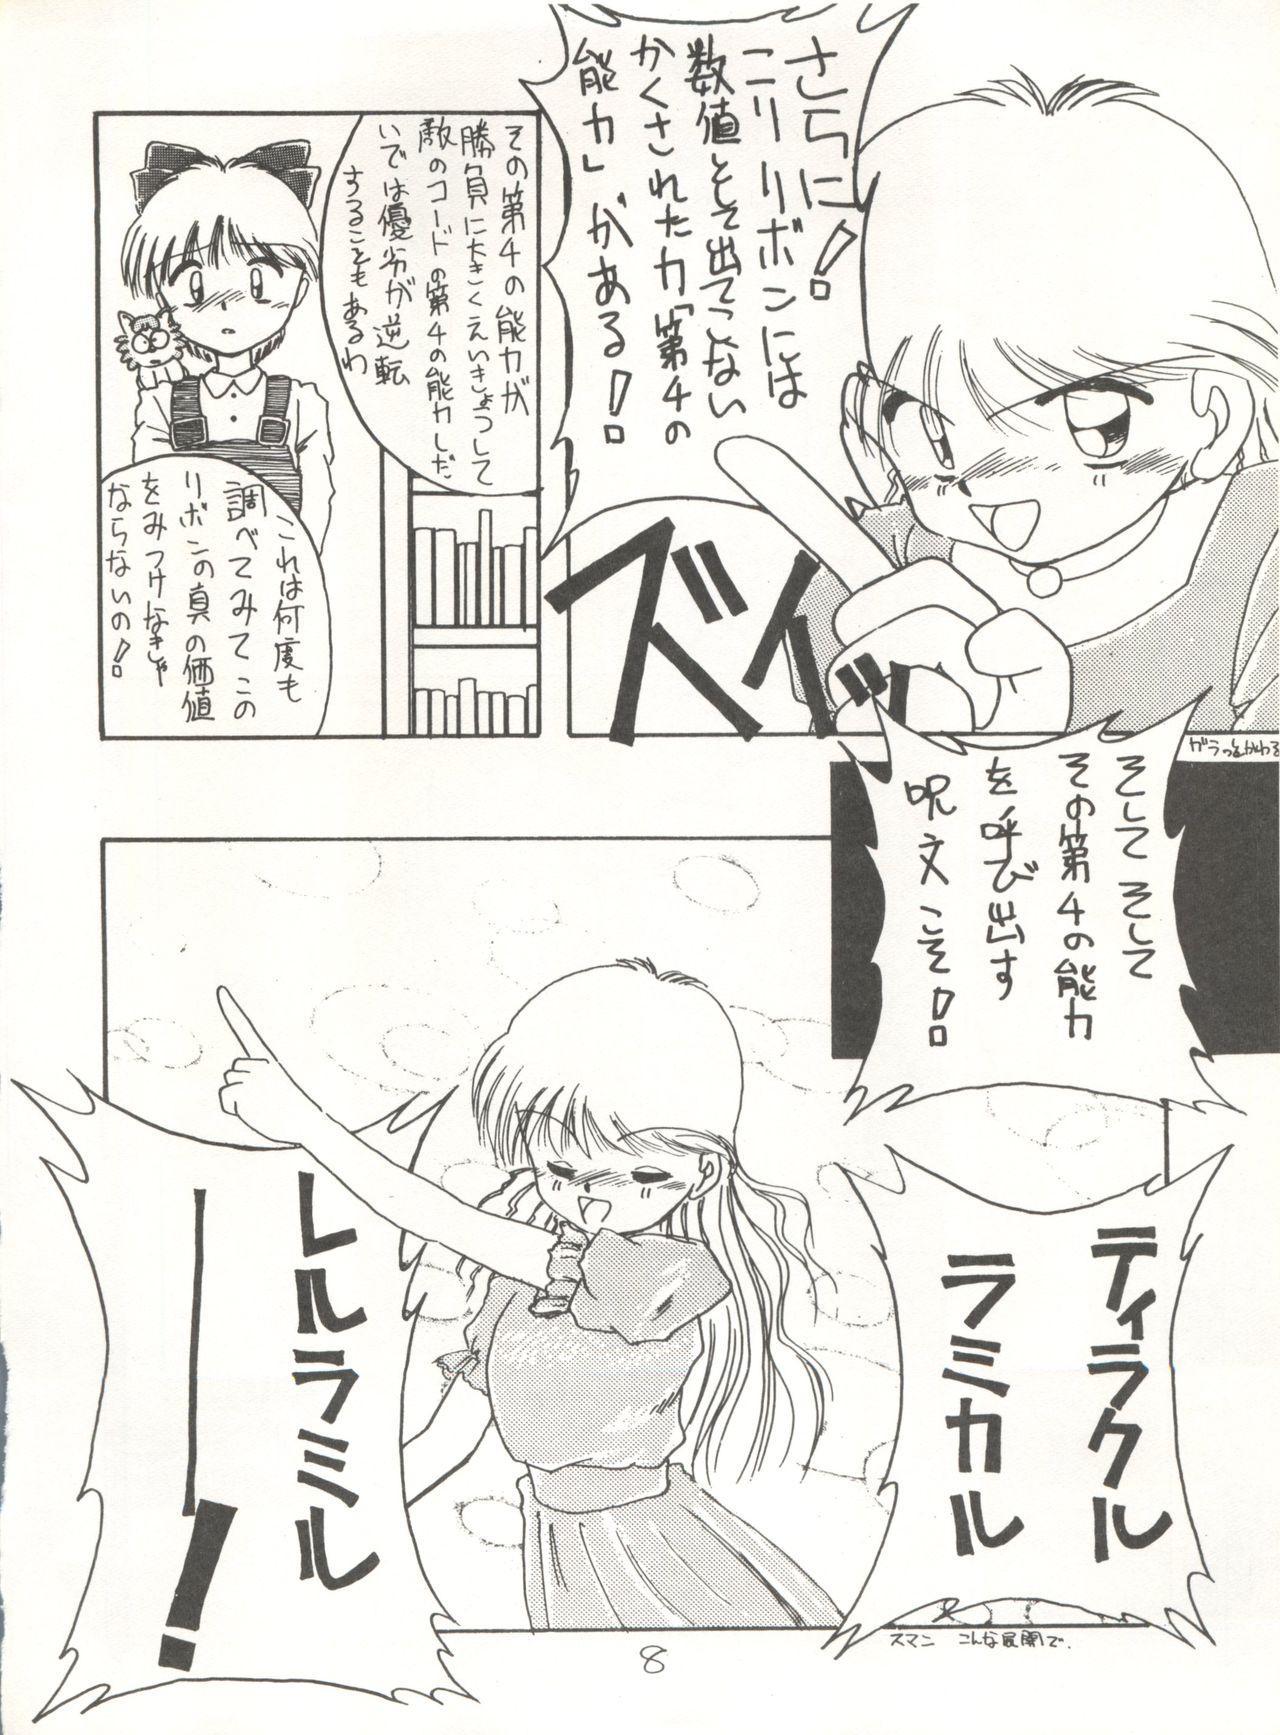 [Global One (MARO)] Sadistic 5 (Cutey Honey, Devilman, Sailor Moon), [Global One (MARO)] Sadistic (Dirty Pair, Fushigi no Umi no Nadia, Sailor Moon), [Studio Ikkatsumajin] .ribbon (Hime-chan's Ribbon) 131